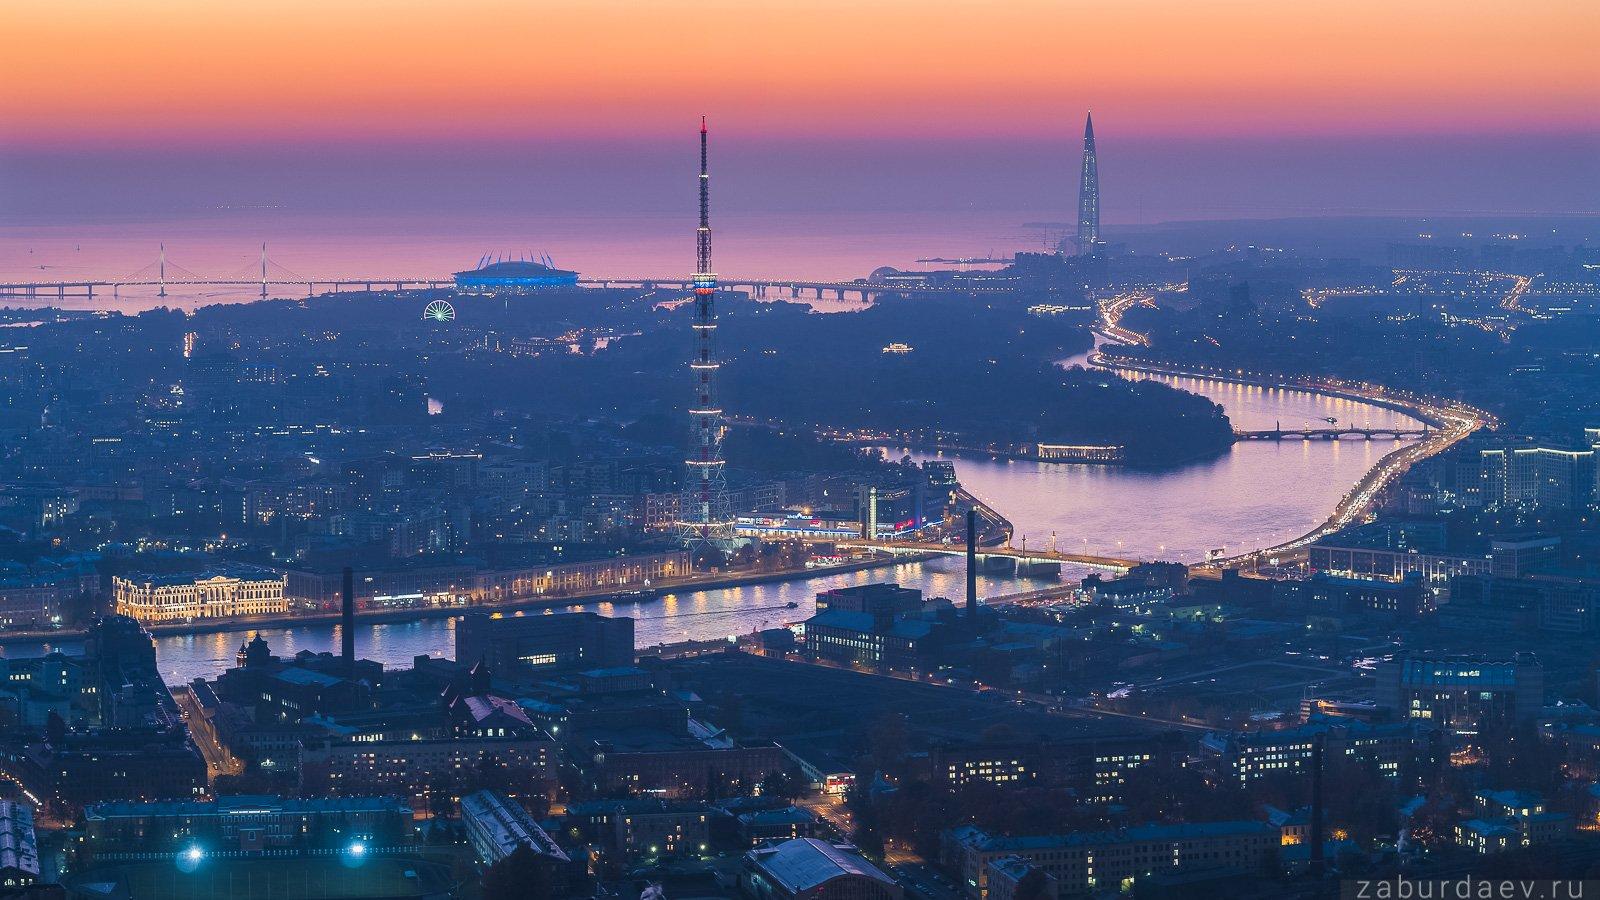 россия, петербург, санкт-петербург, вечер, закат, осень, город, архитектура, дрон, Станислав Забурдаев